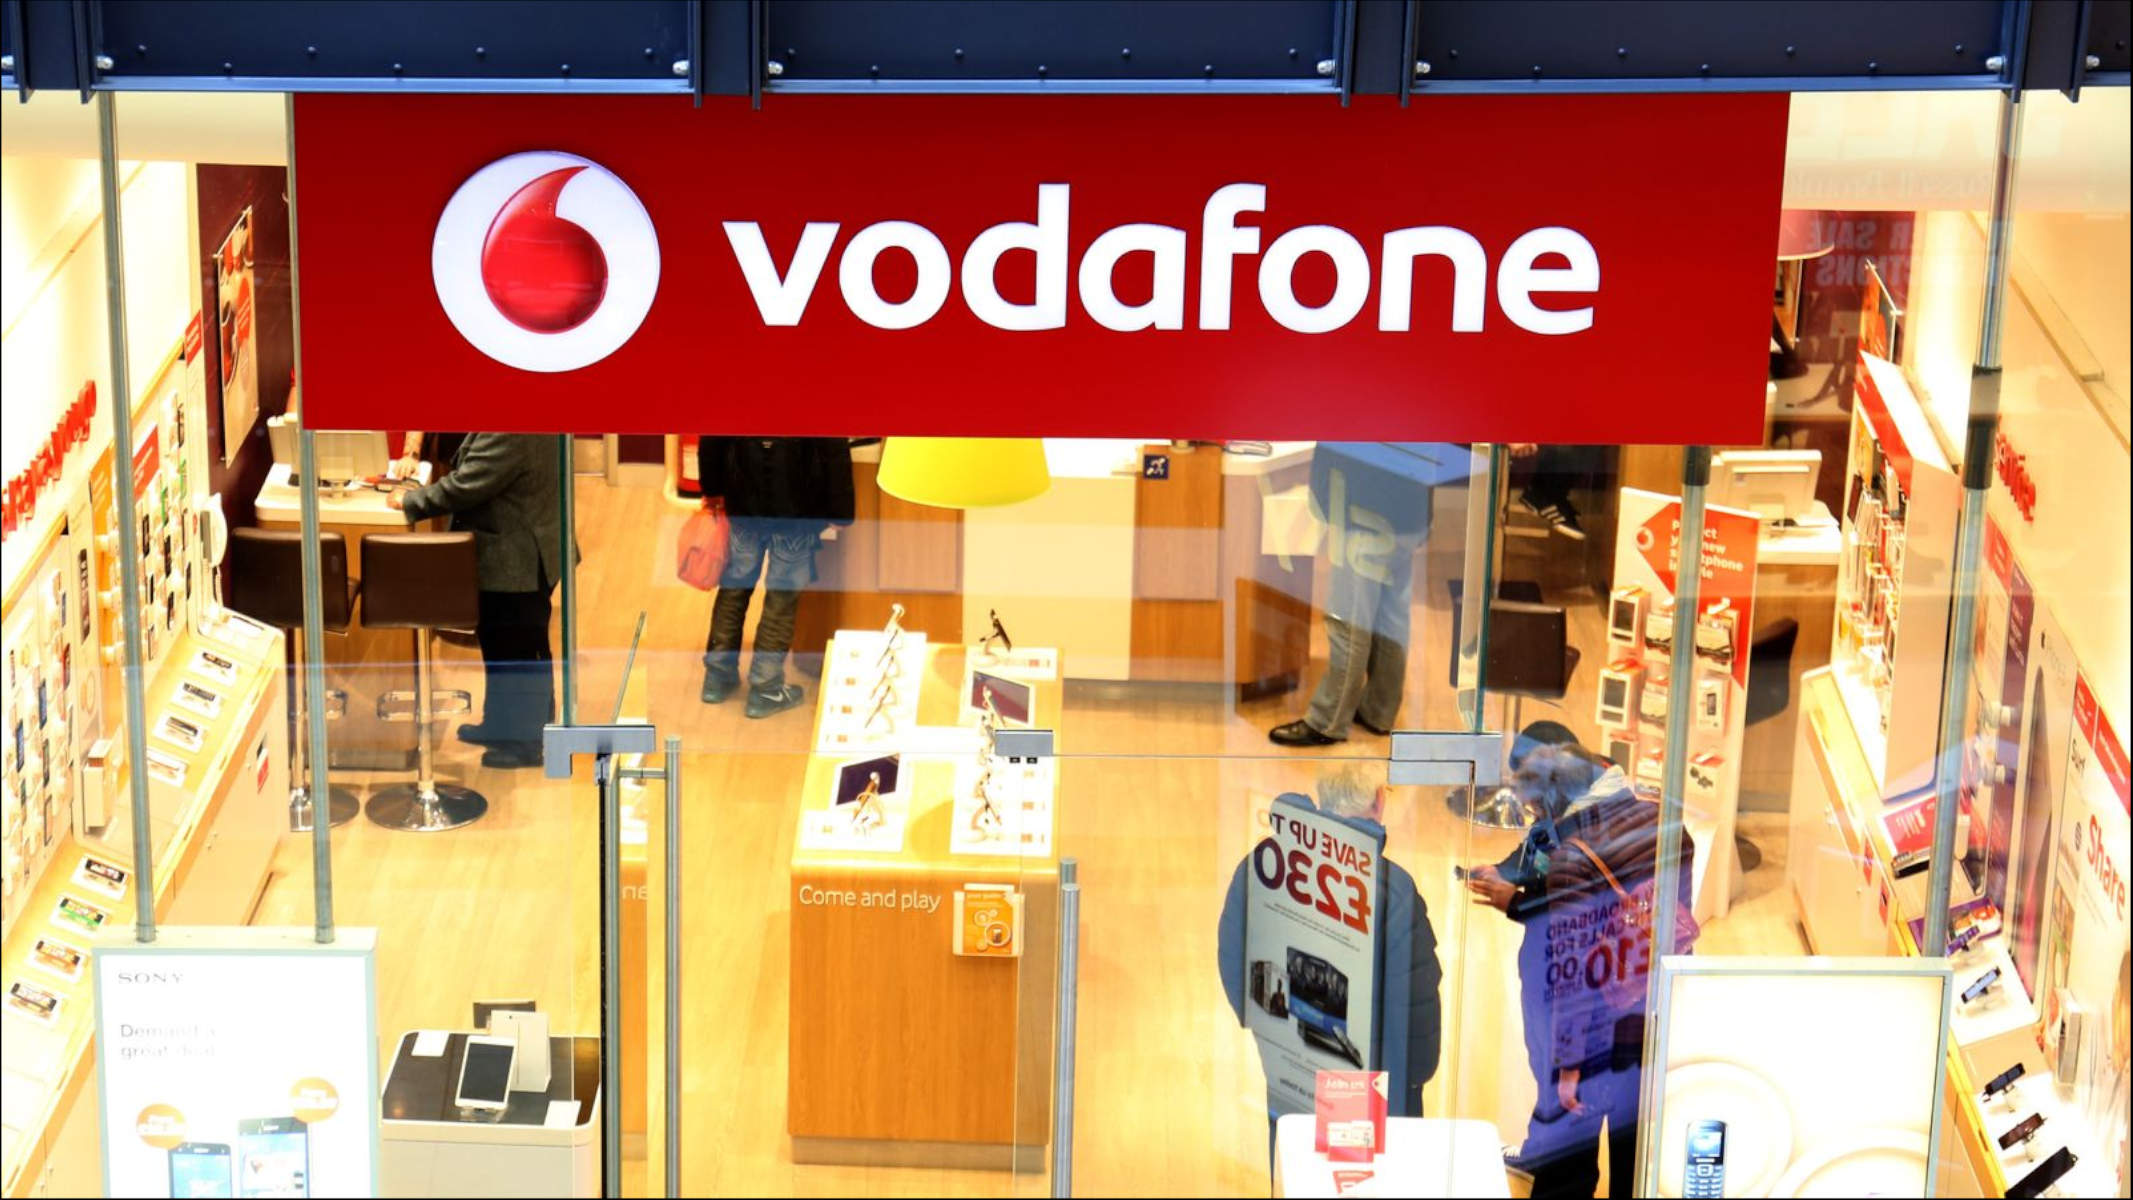 Vodafone UK Roaming Pagamento